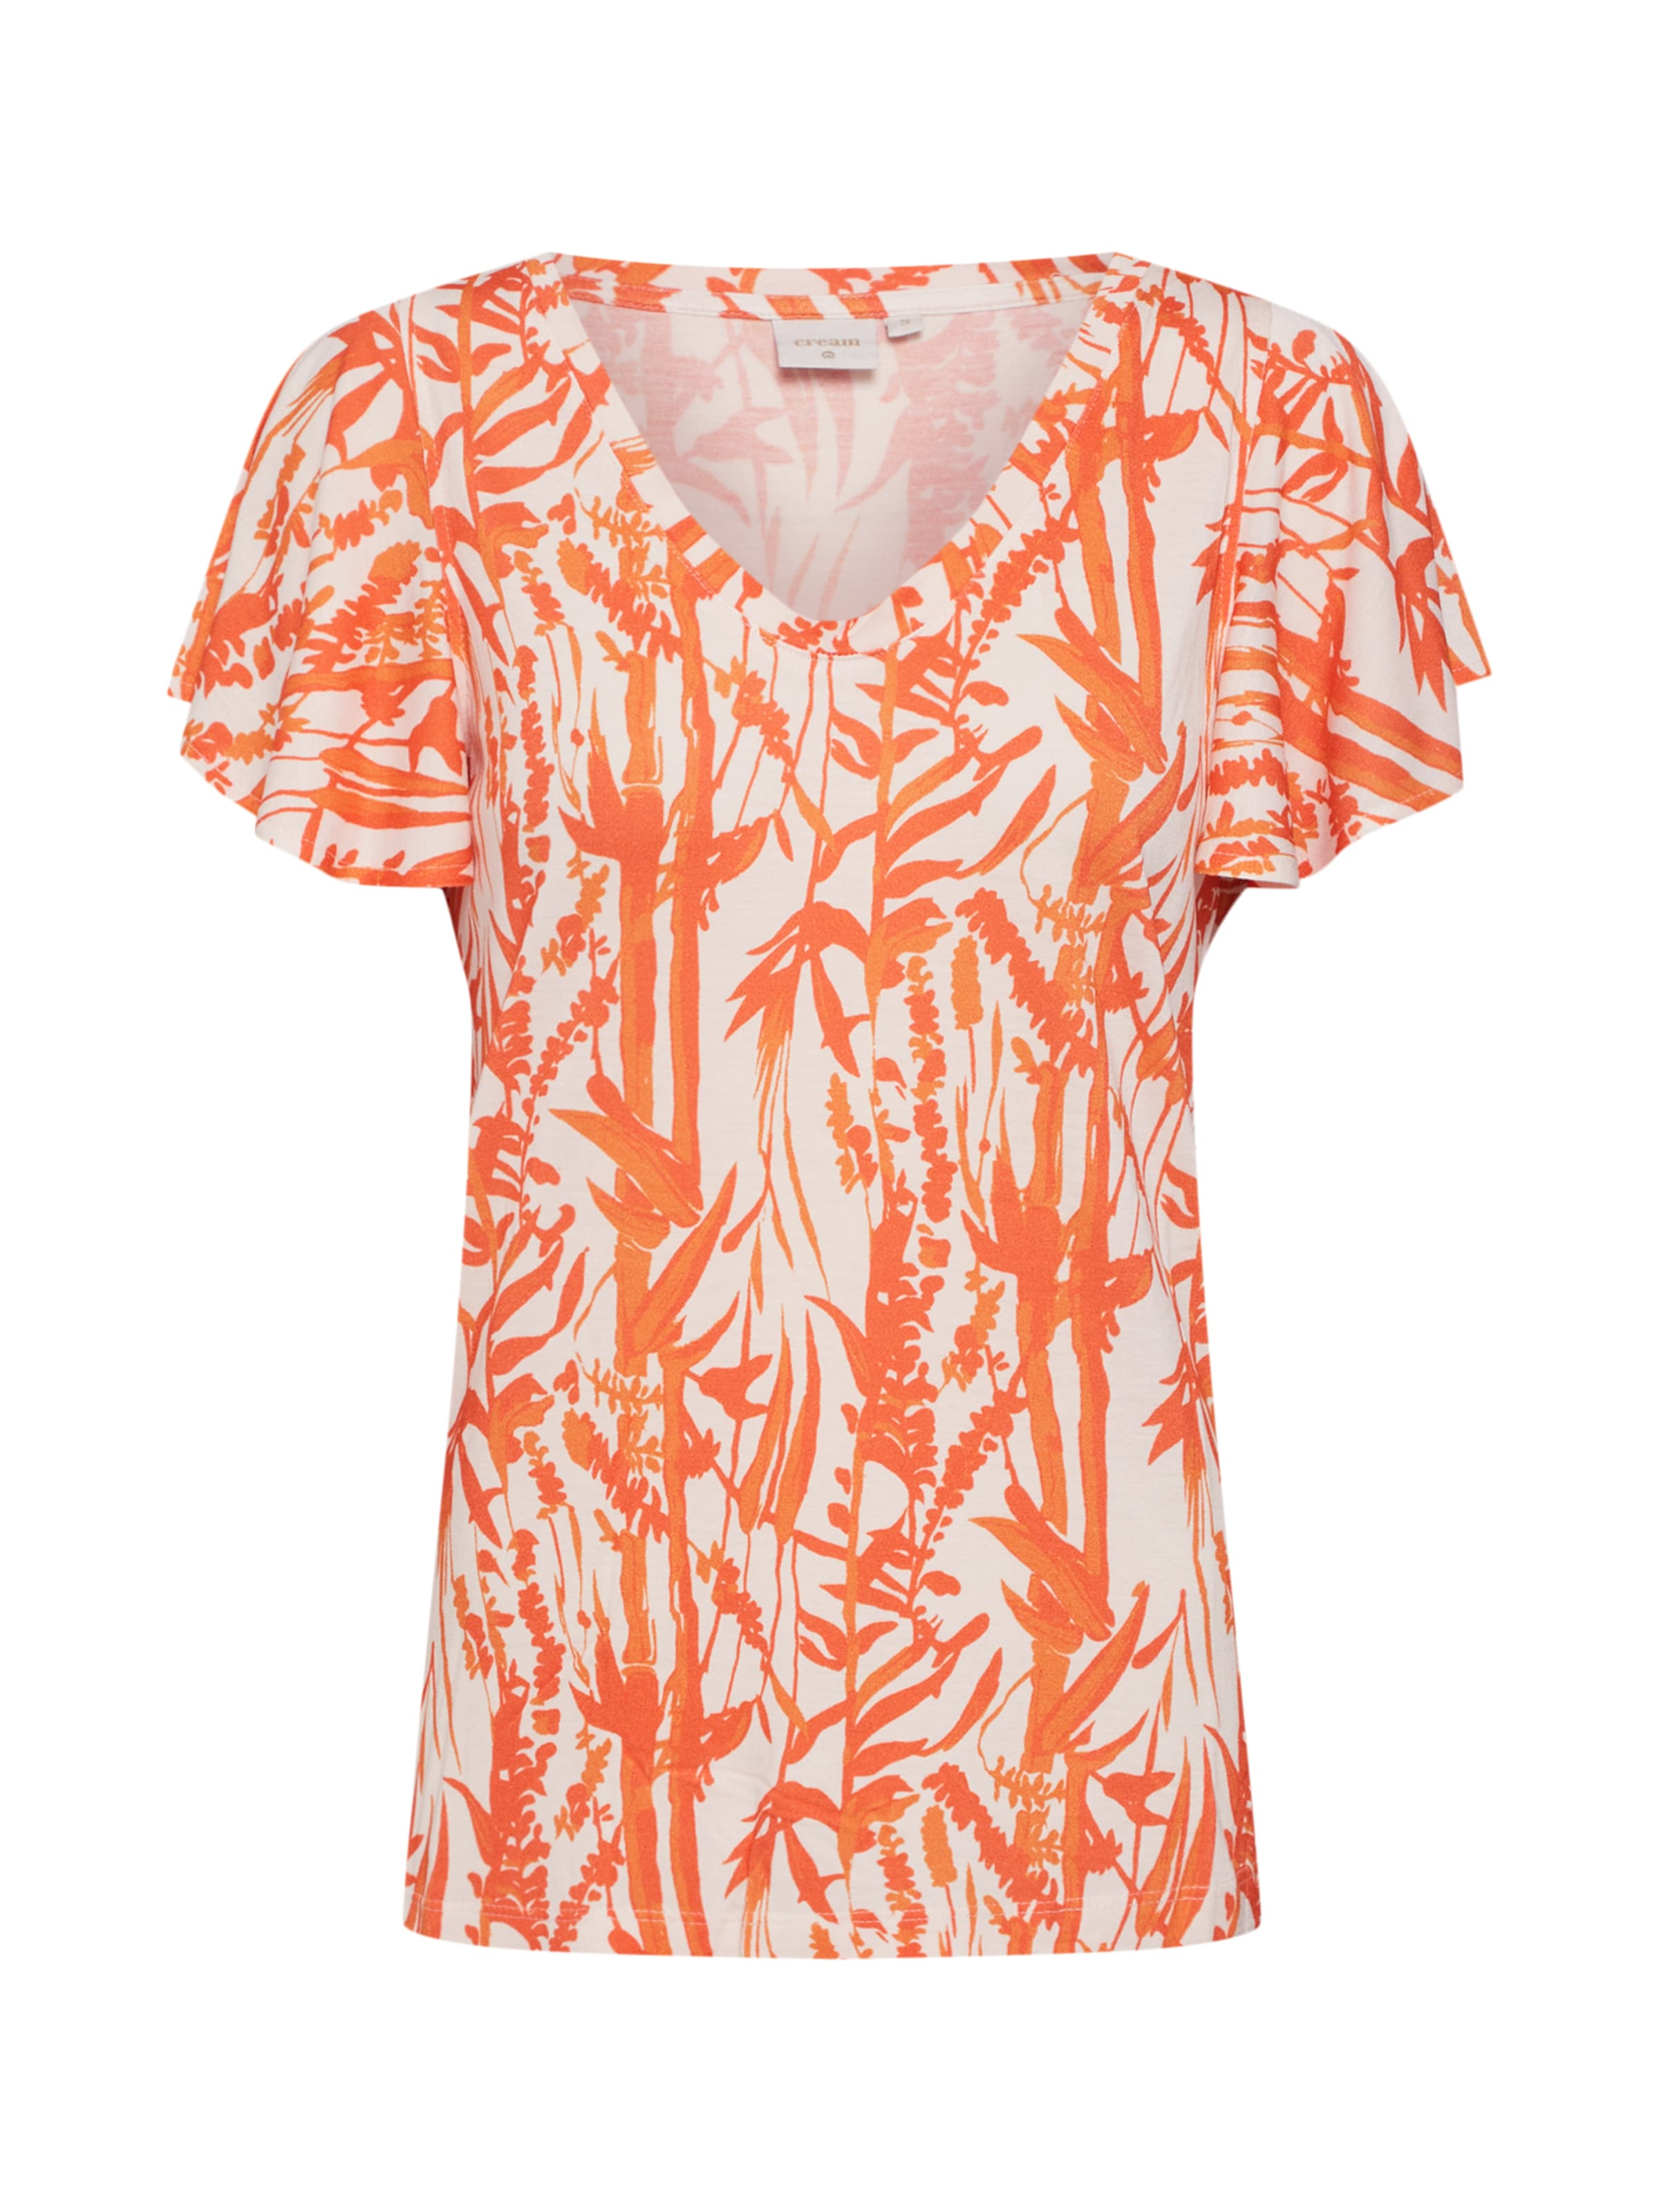 En Cream shirt 'ninna' T OrangeBlanc AL54Rcjq3